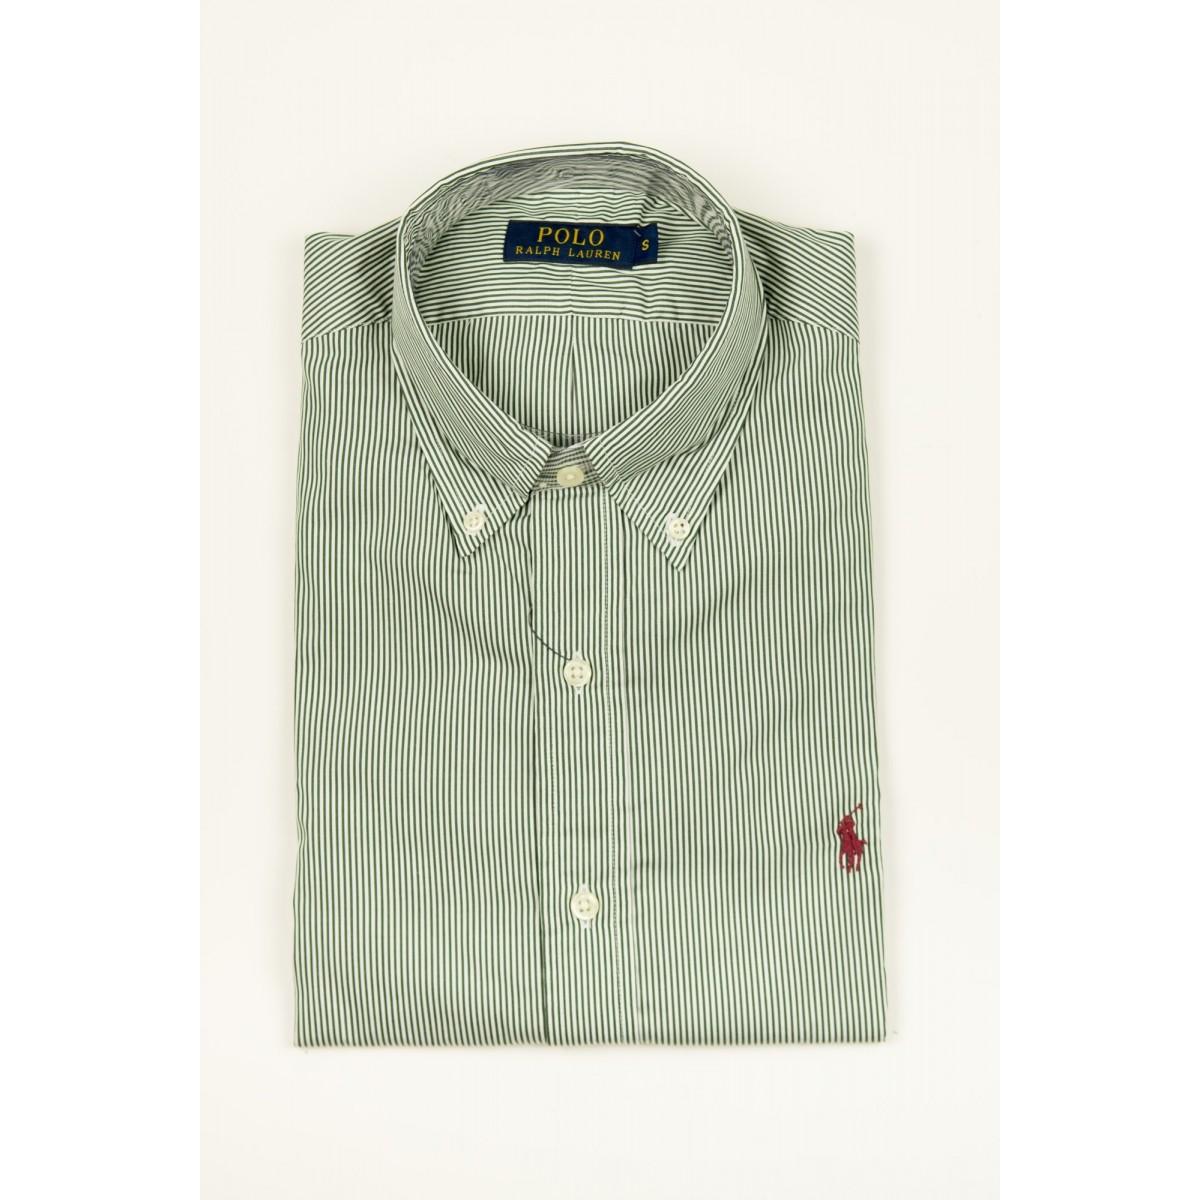 Shirt Polo Ralph Lauren - A04Wbdbdcpop5 C3FL2 - riga verde